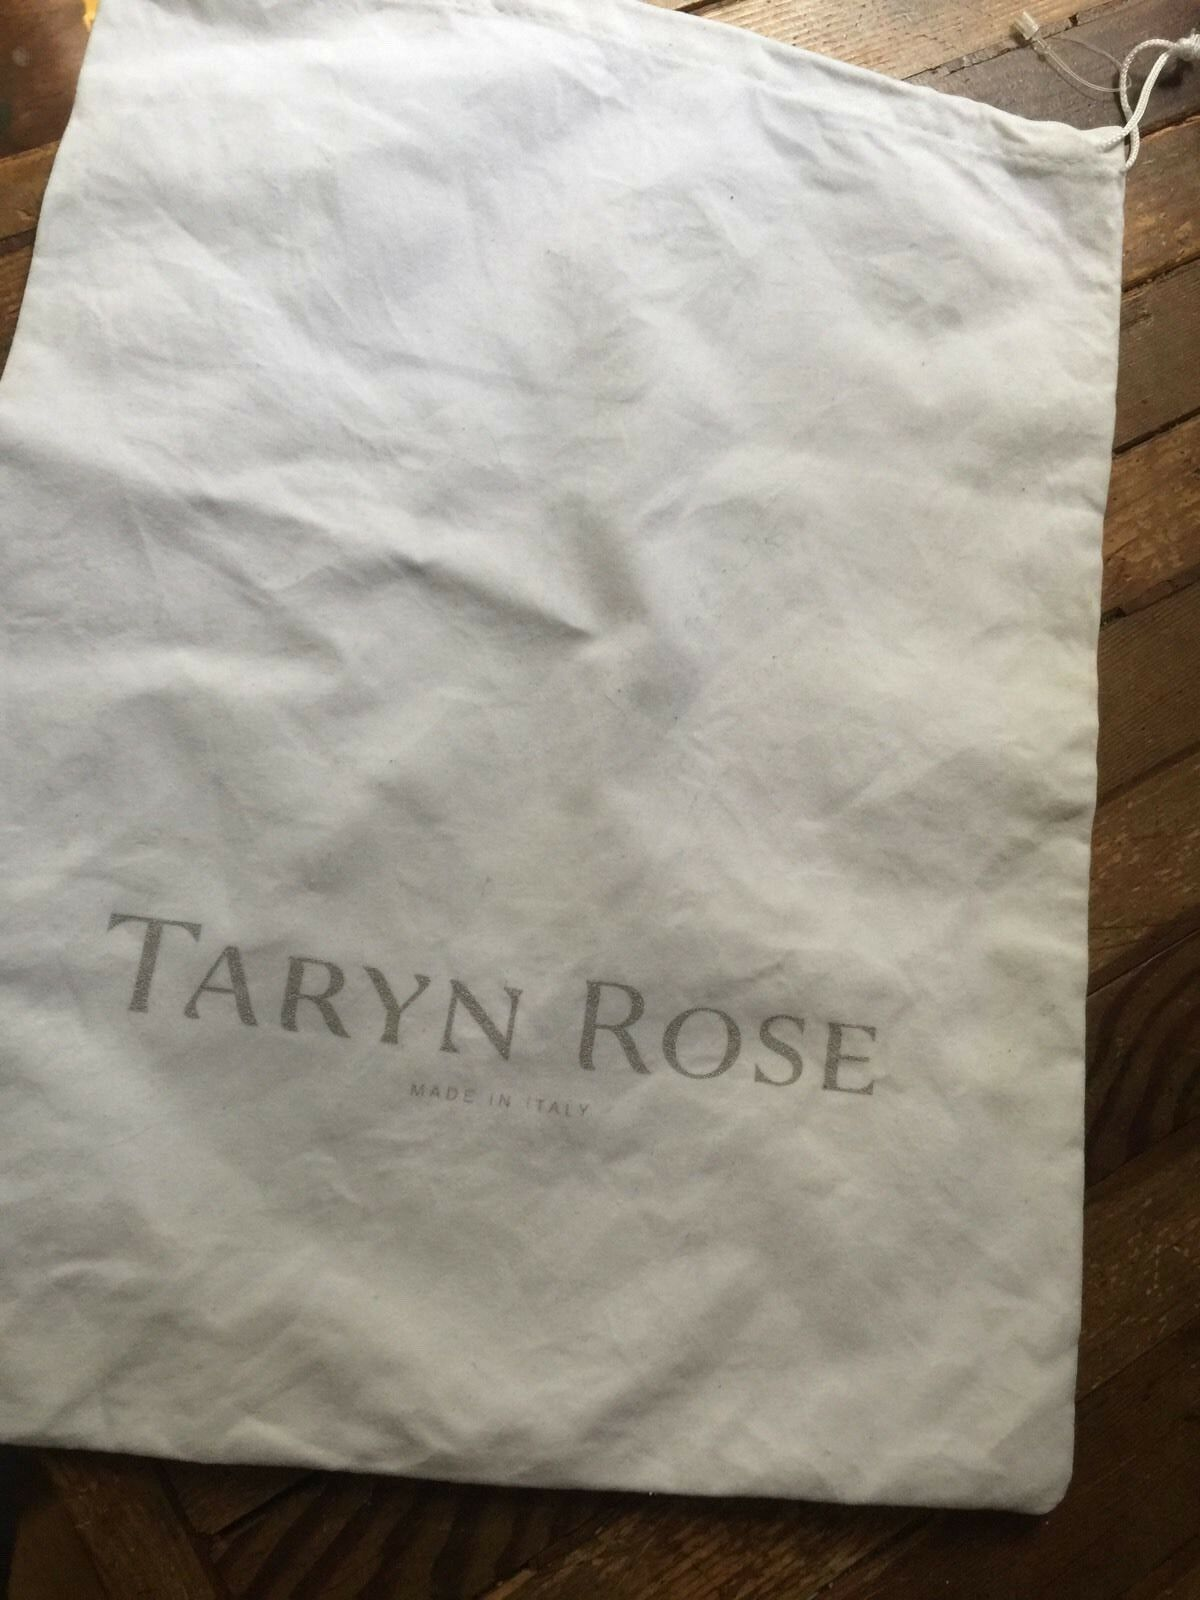 TARYN ROSE COPPER Flats Leder ITALY Niedrig Pumps Embossed Rose ITALY Leder 40.5 US 10 +BAG 764563